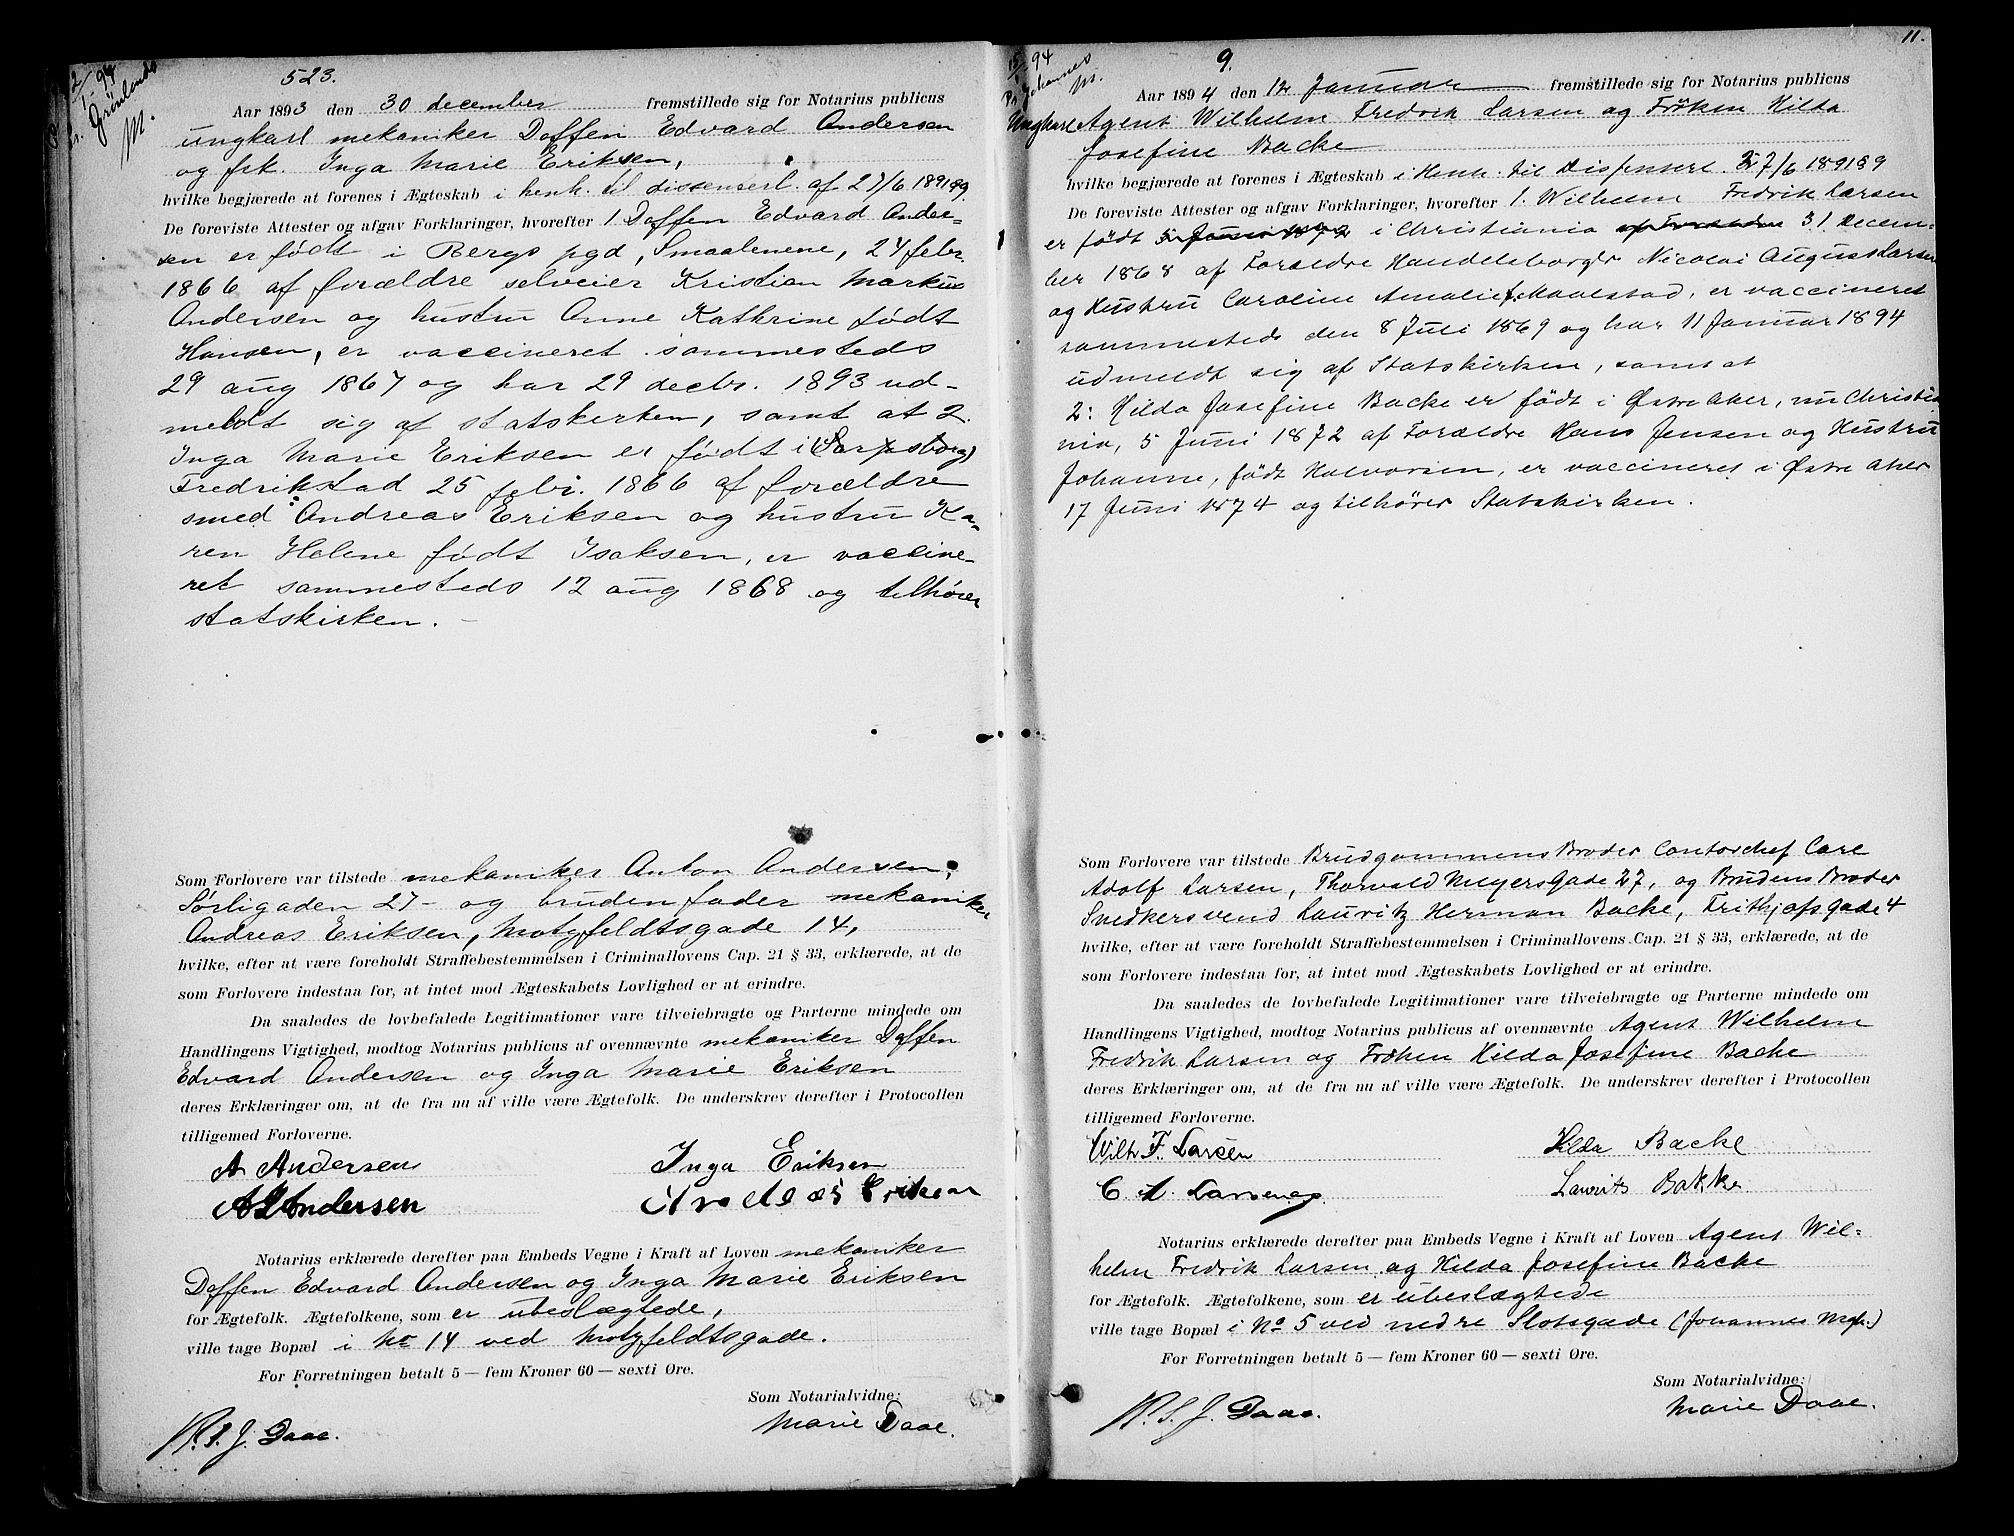 SAO, Oslo byfogd avd. I, L/Lb/Lbb/L0002: Notarialprotokoll, rekke II: Vigsler, 1893-1897, s. 10b-11a